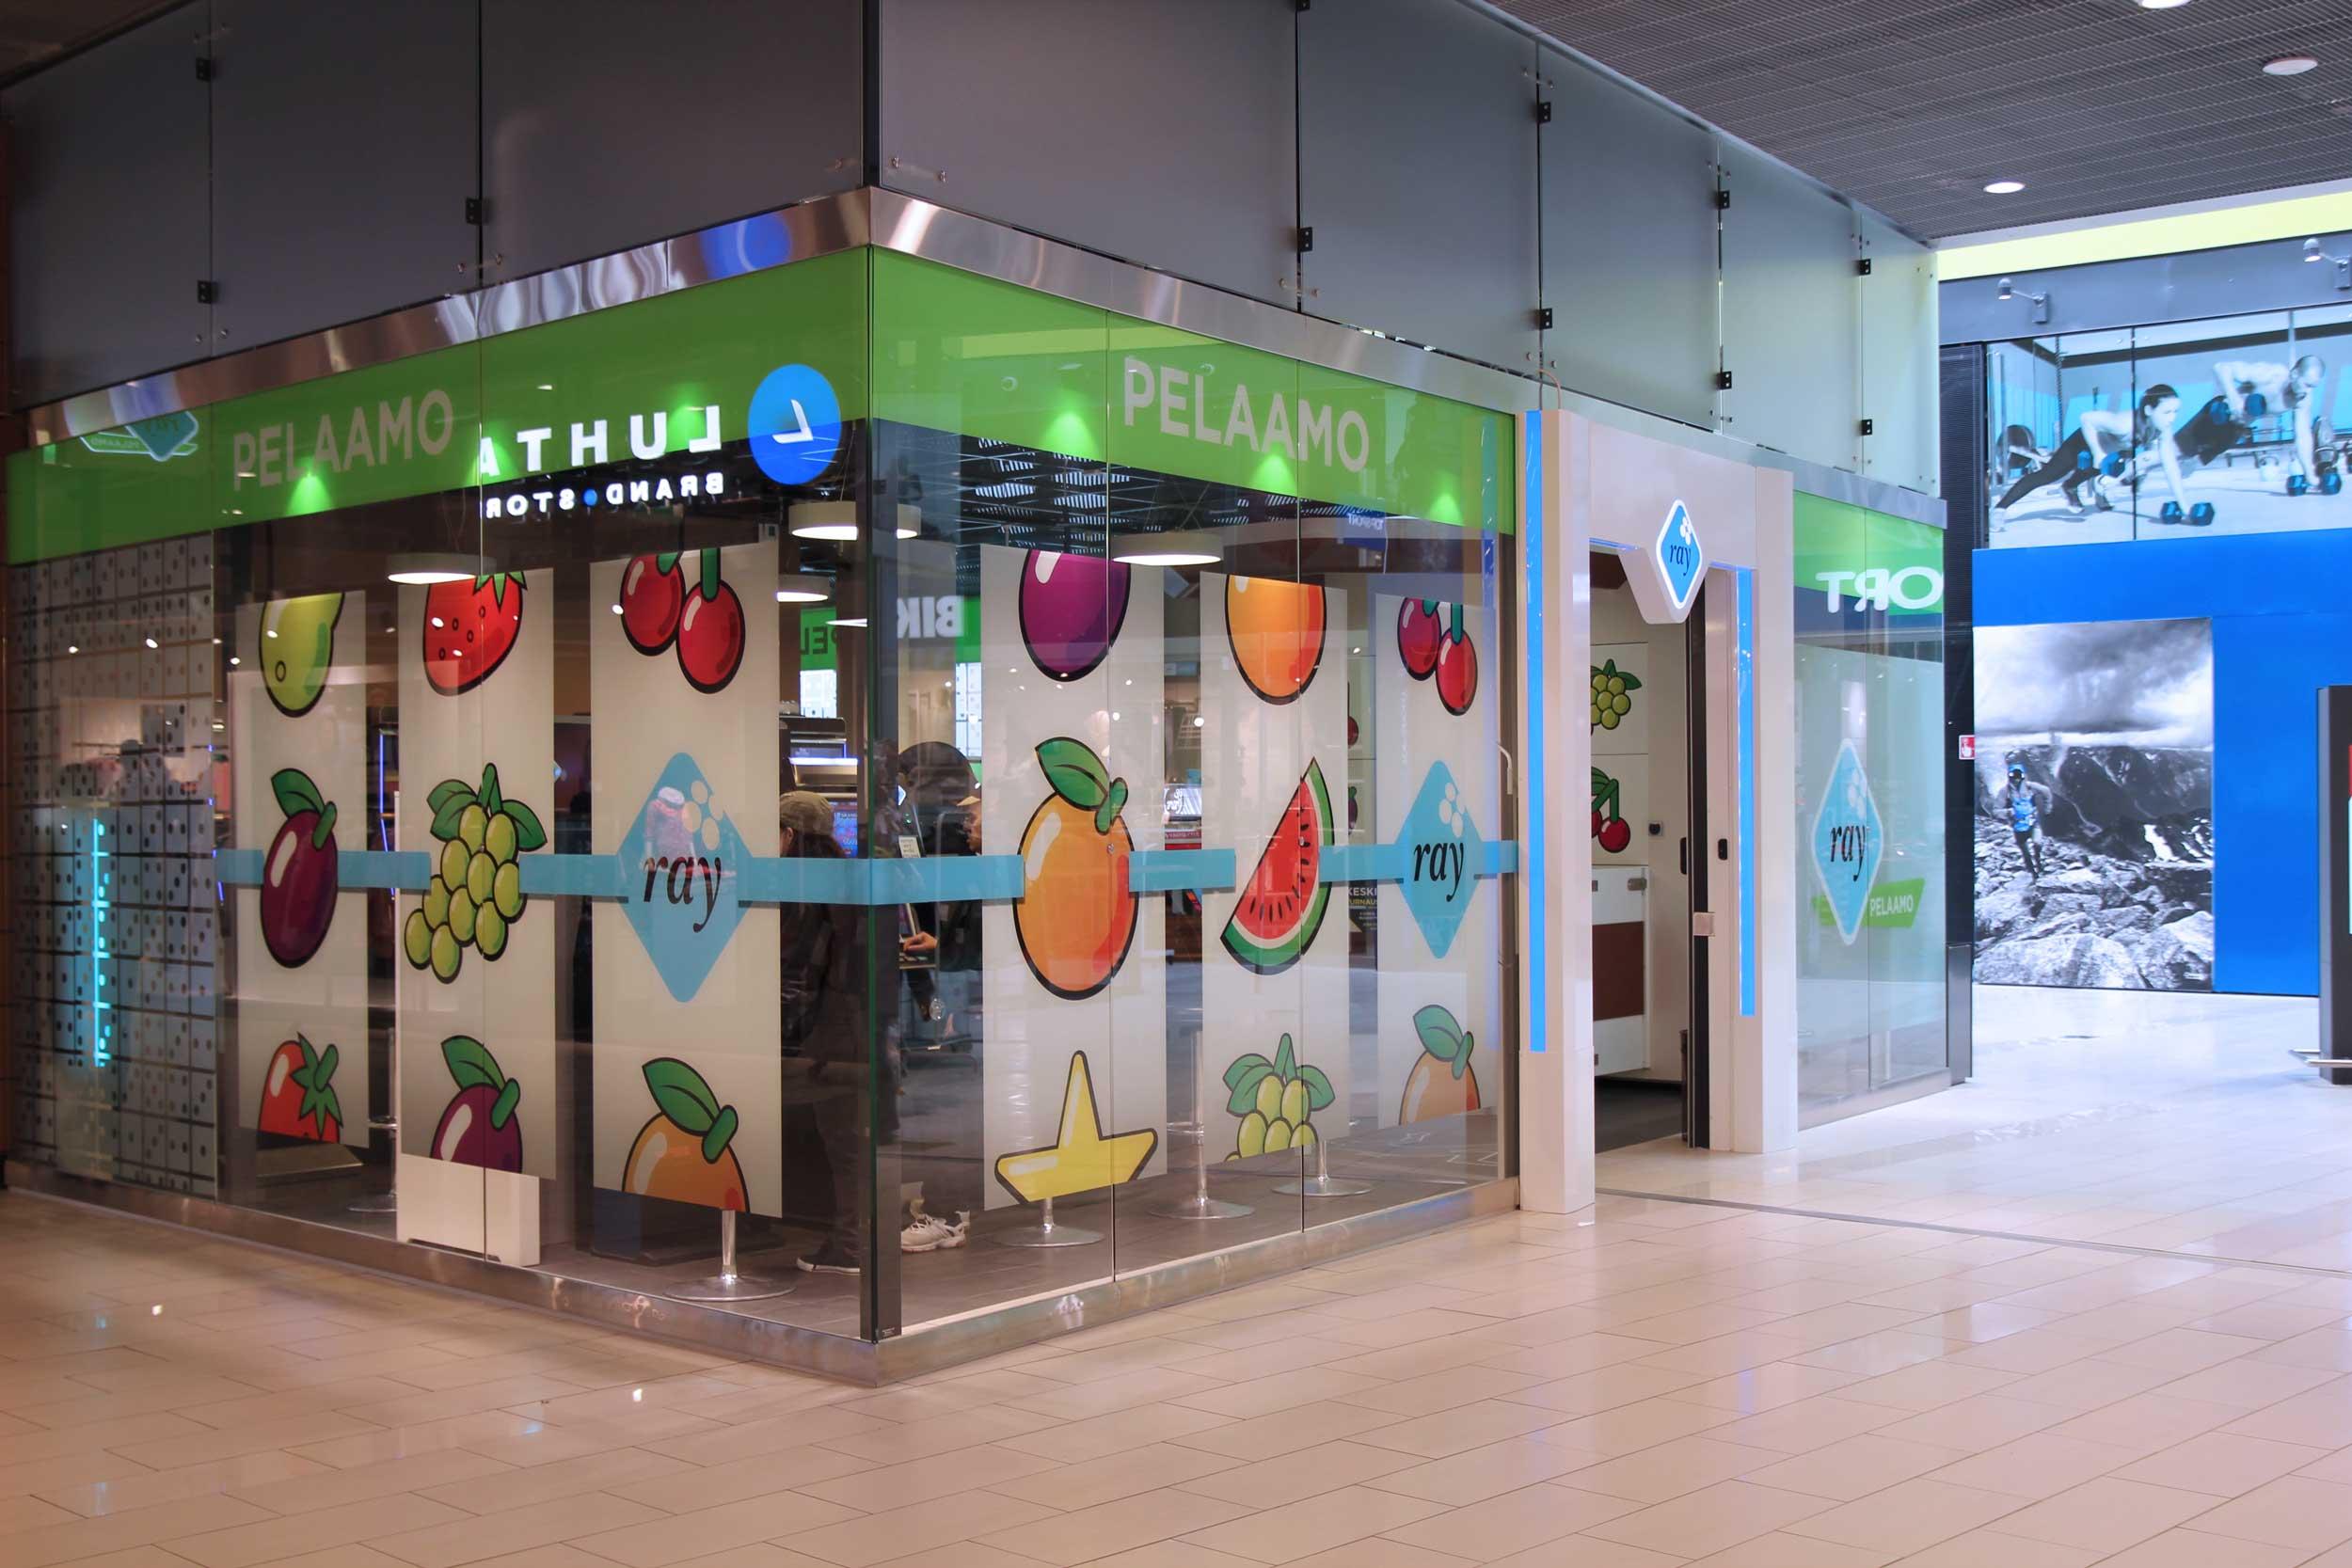 Scanmikael_Movable glass walls_Shopping centre Kaari_Helsinki